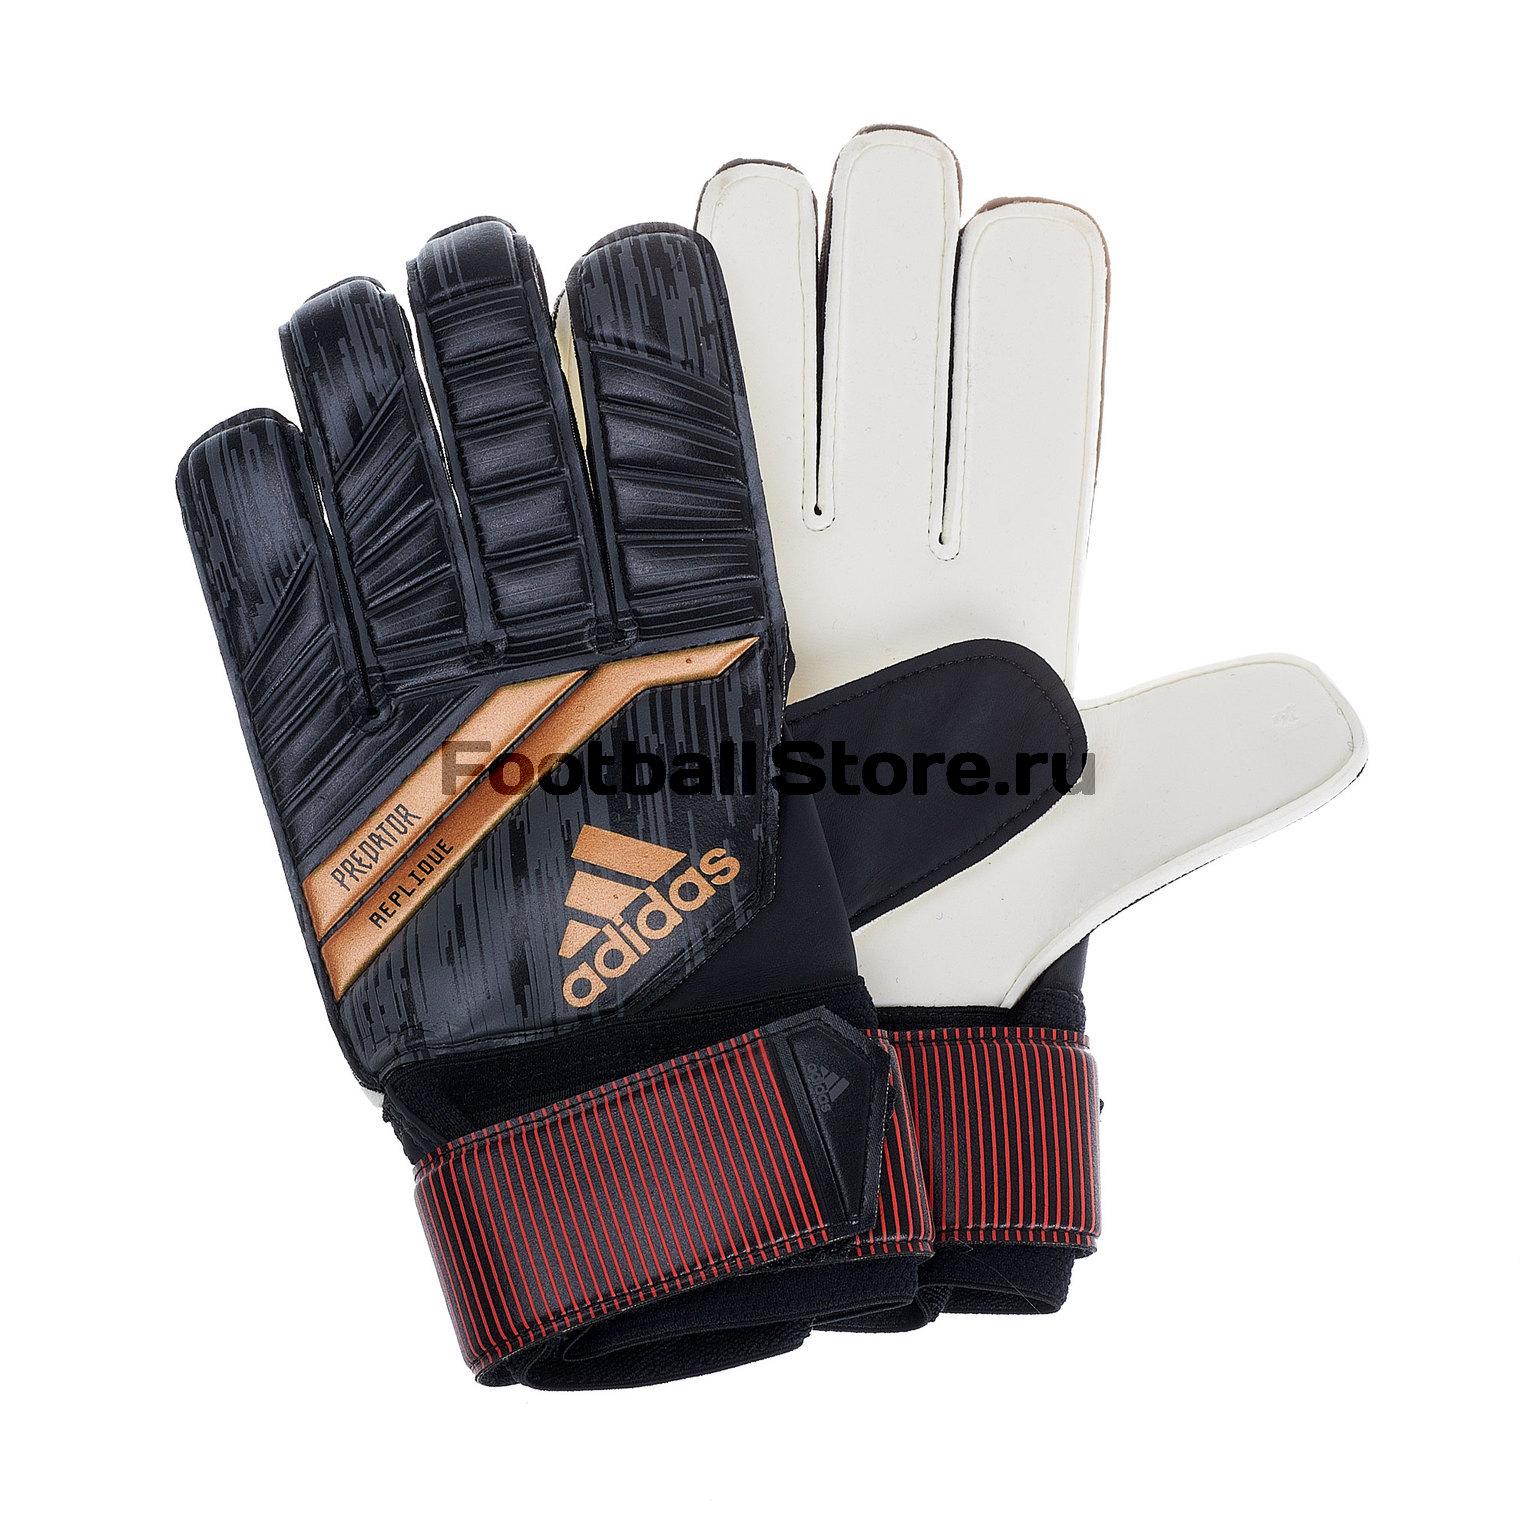 Перчатки вратарские Adidas Pre Replique CF1363 adidas adidas ace replique goalkeeper gloves